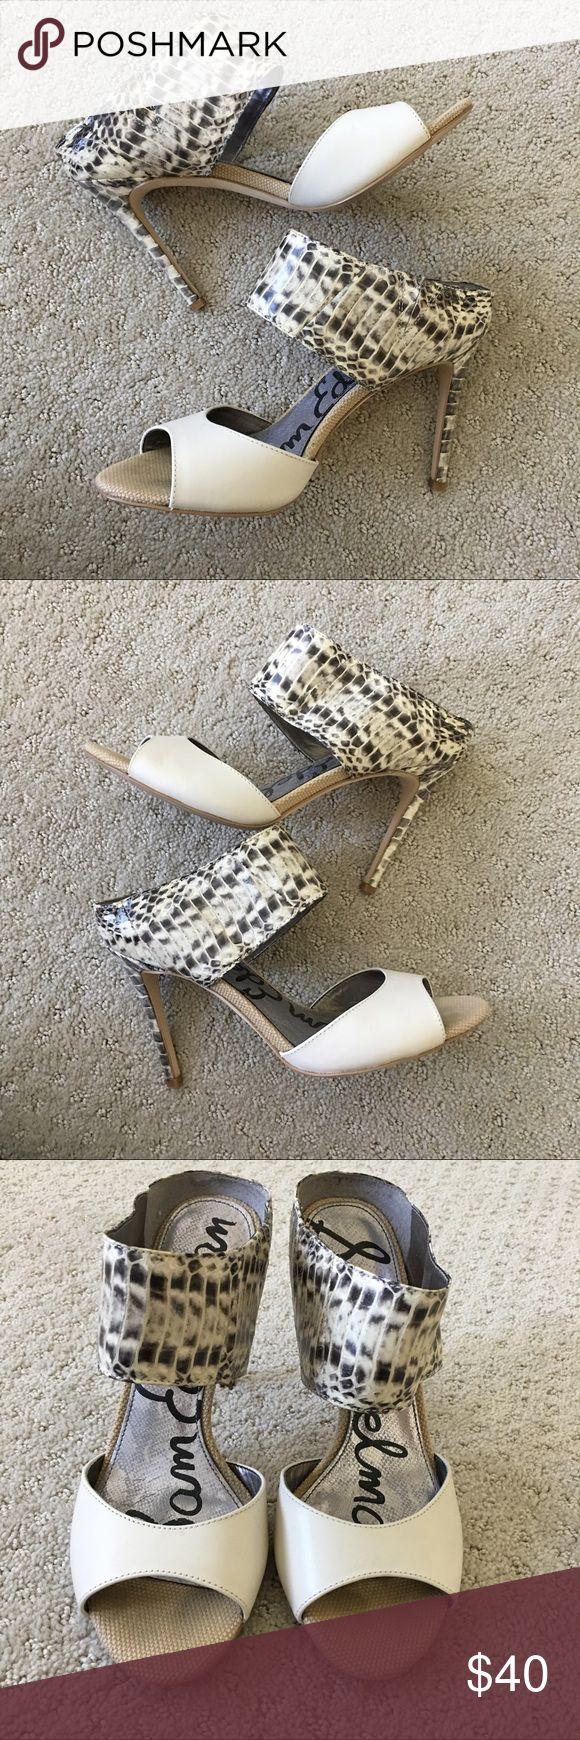 Sam Edelman Scotti Snakeskin Heels Only worn a few times & in great condition! Sam Edelman Shoes Heels